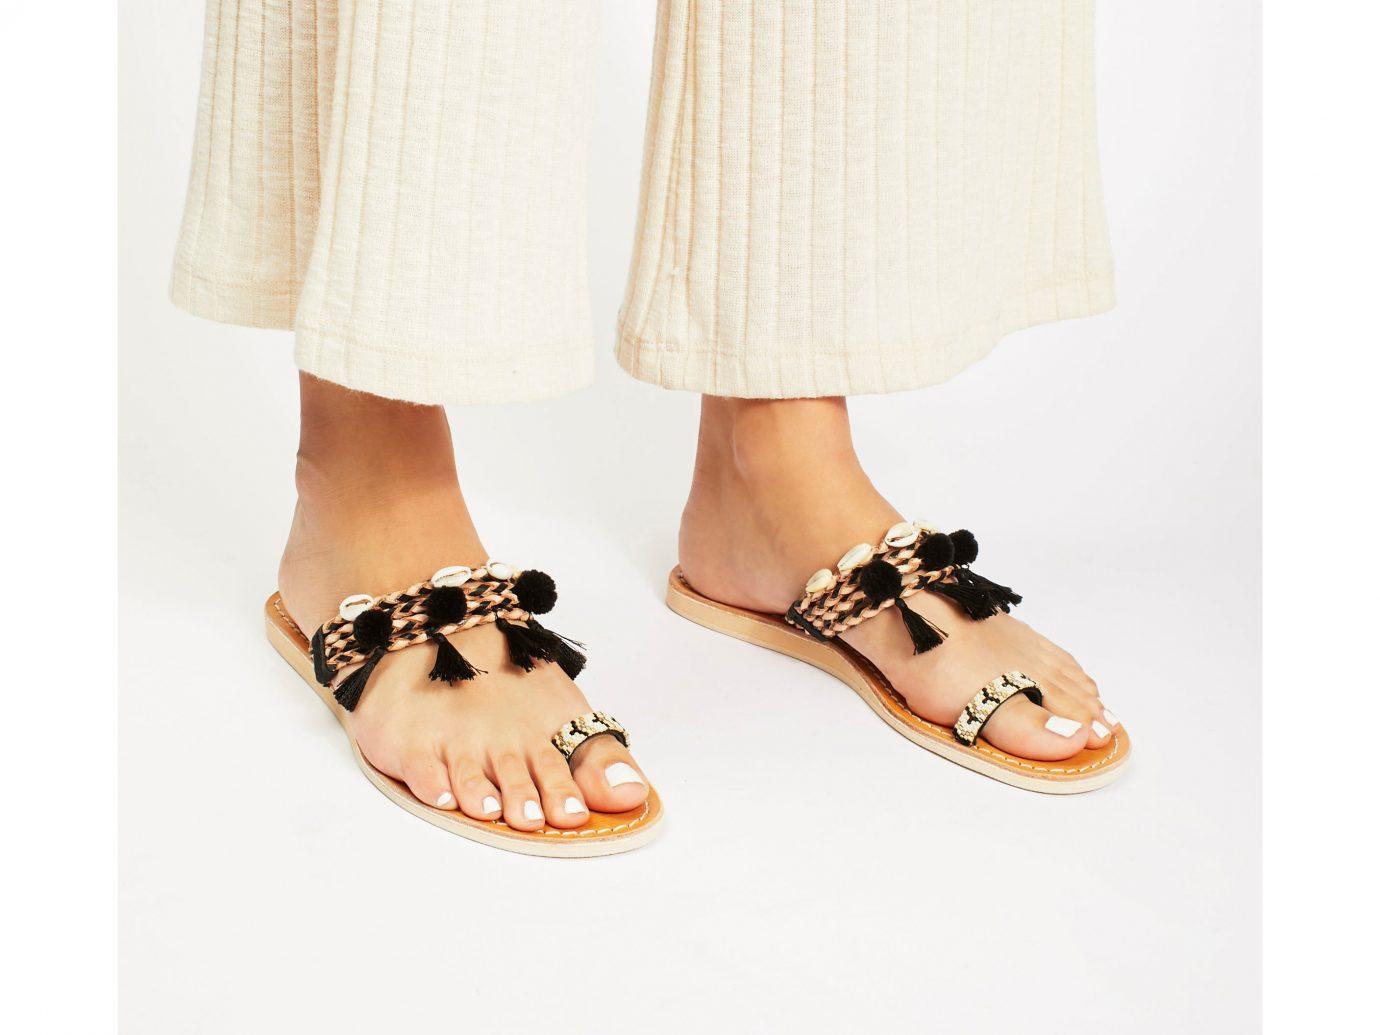 Cruise Travel Style + Design footwear shoe leg product sandal spring pattern outdoor shoe human body beige sneakers